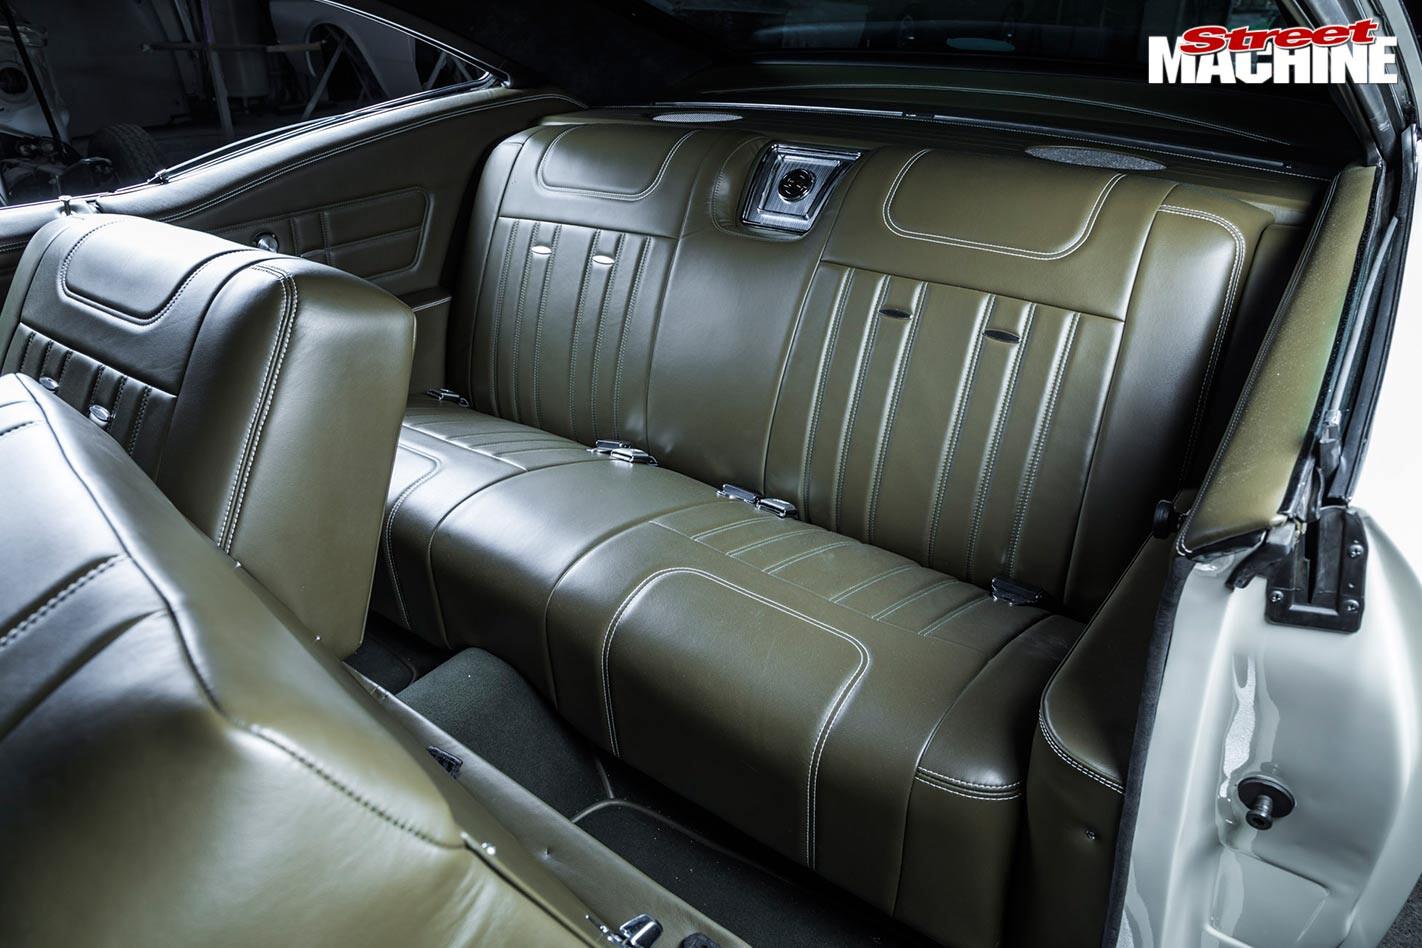 Chev Impala rear seats